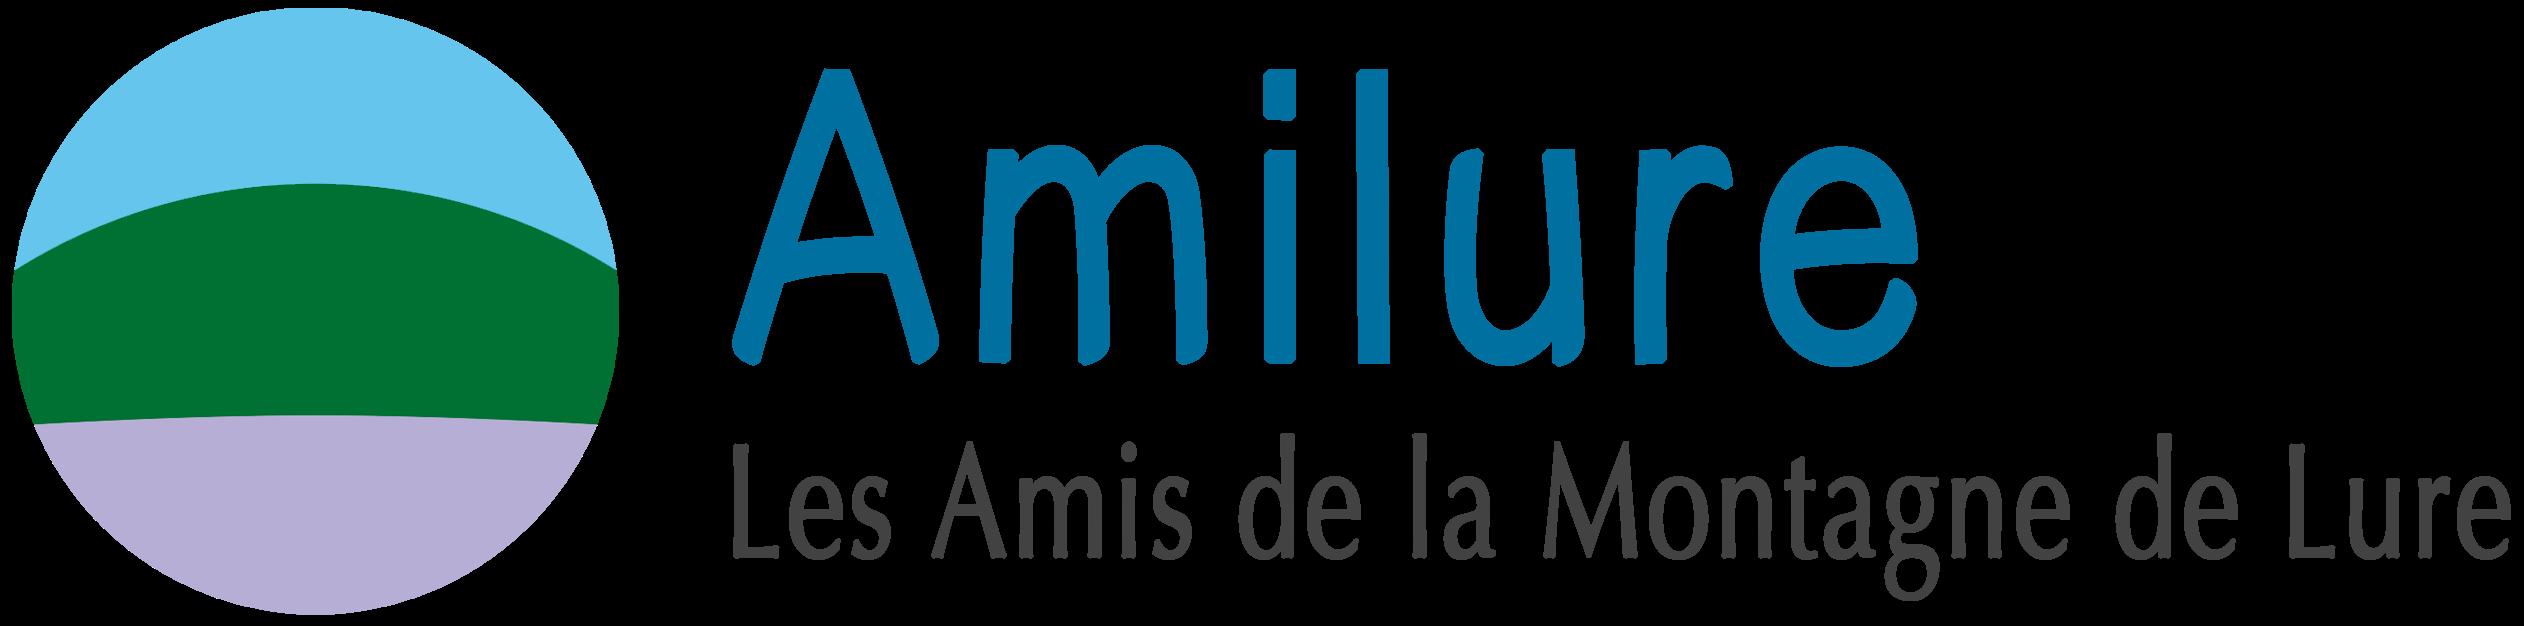 Amilure